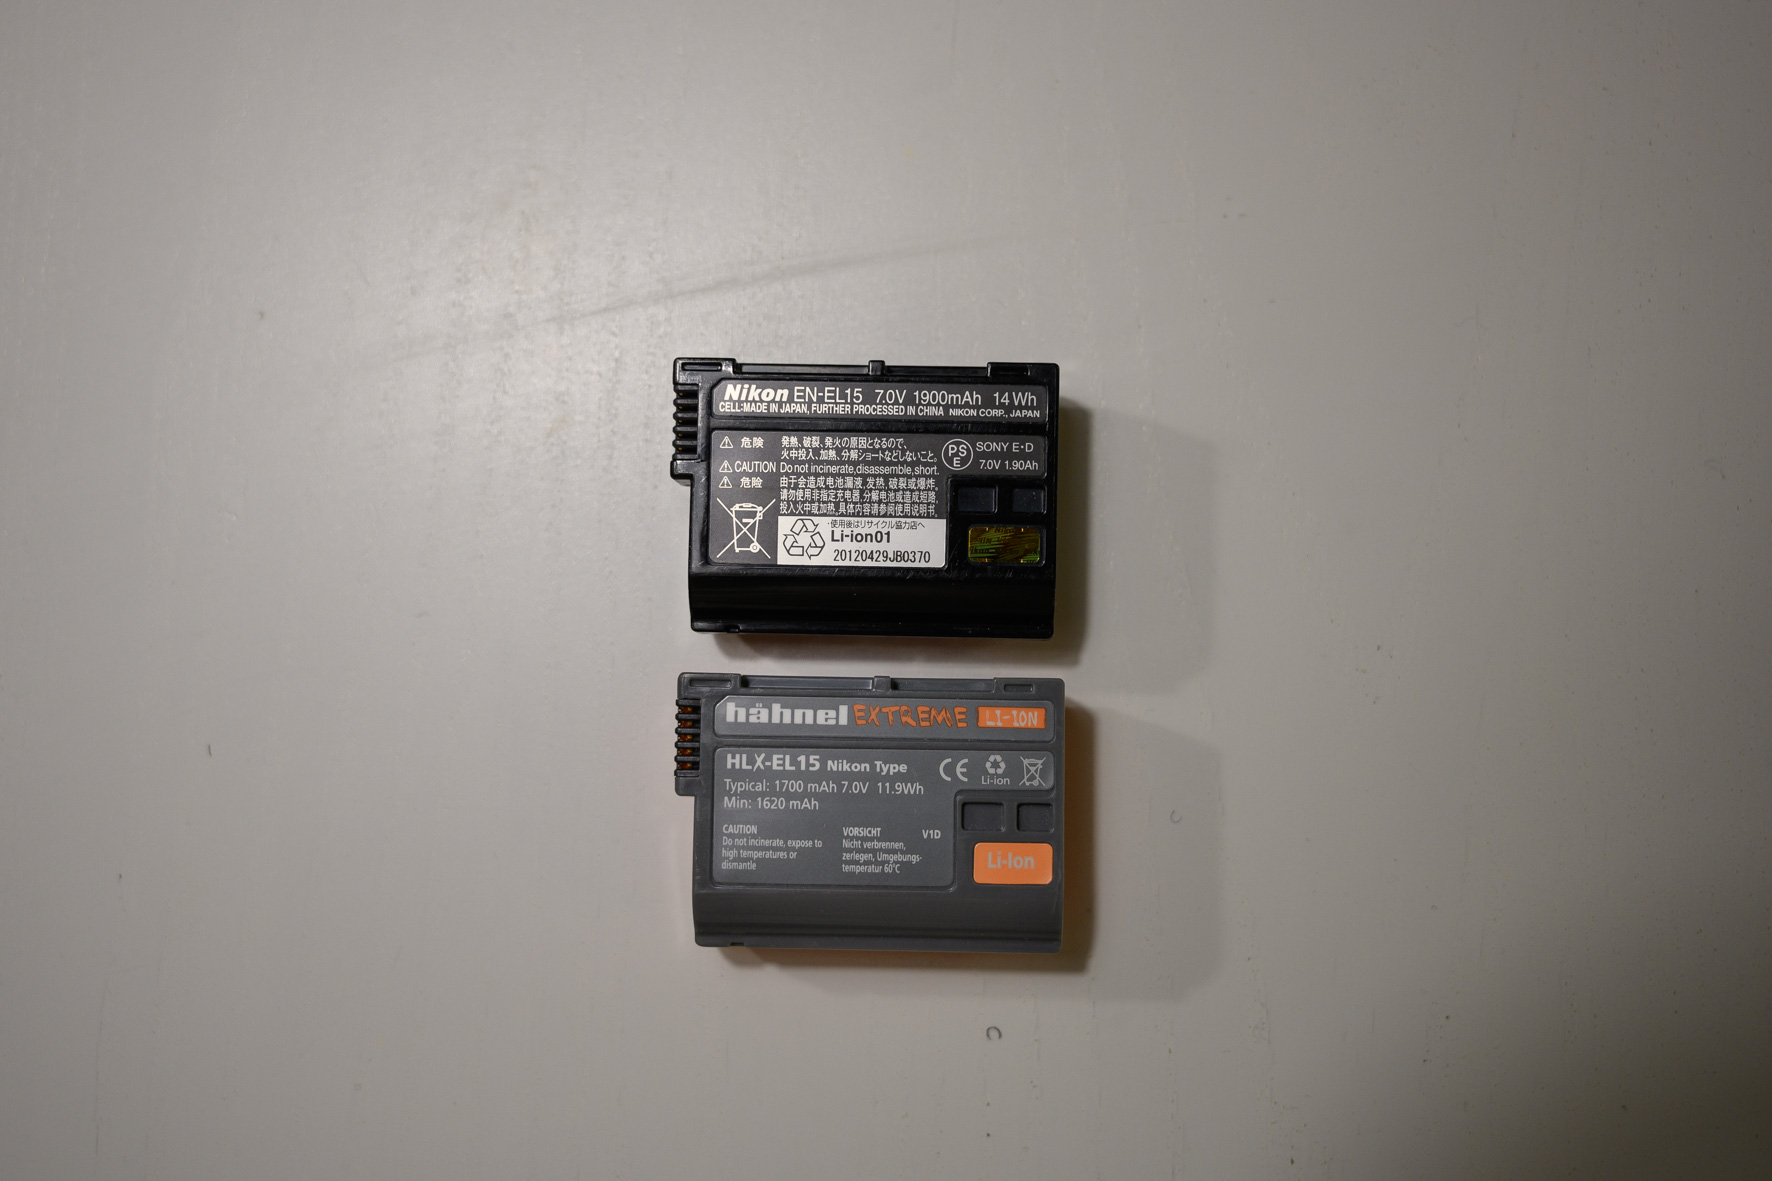 Nikon D800 010.JPG